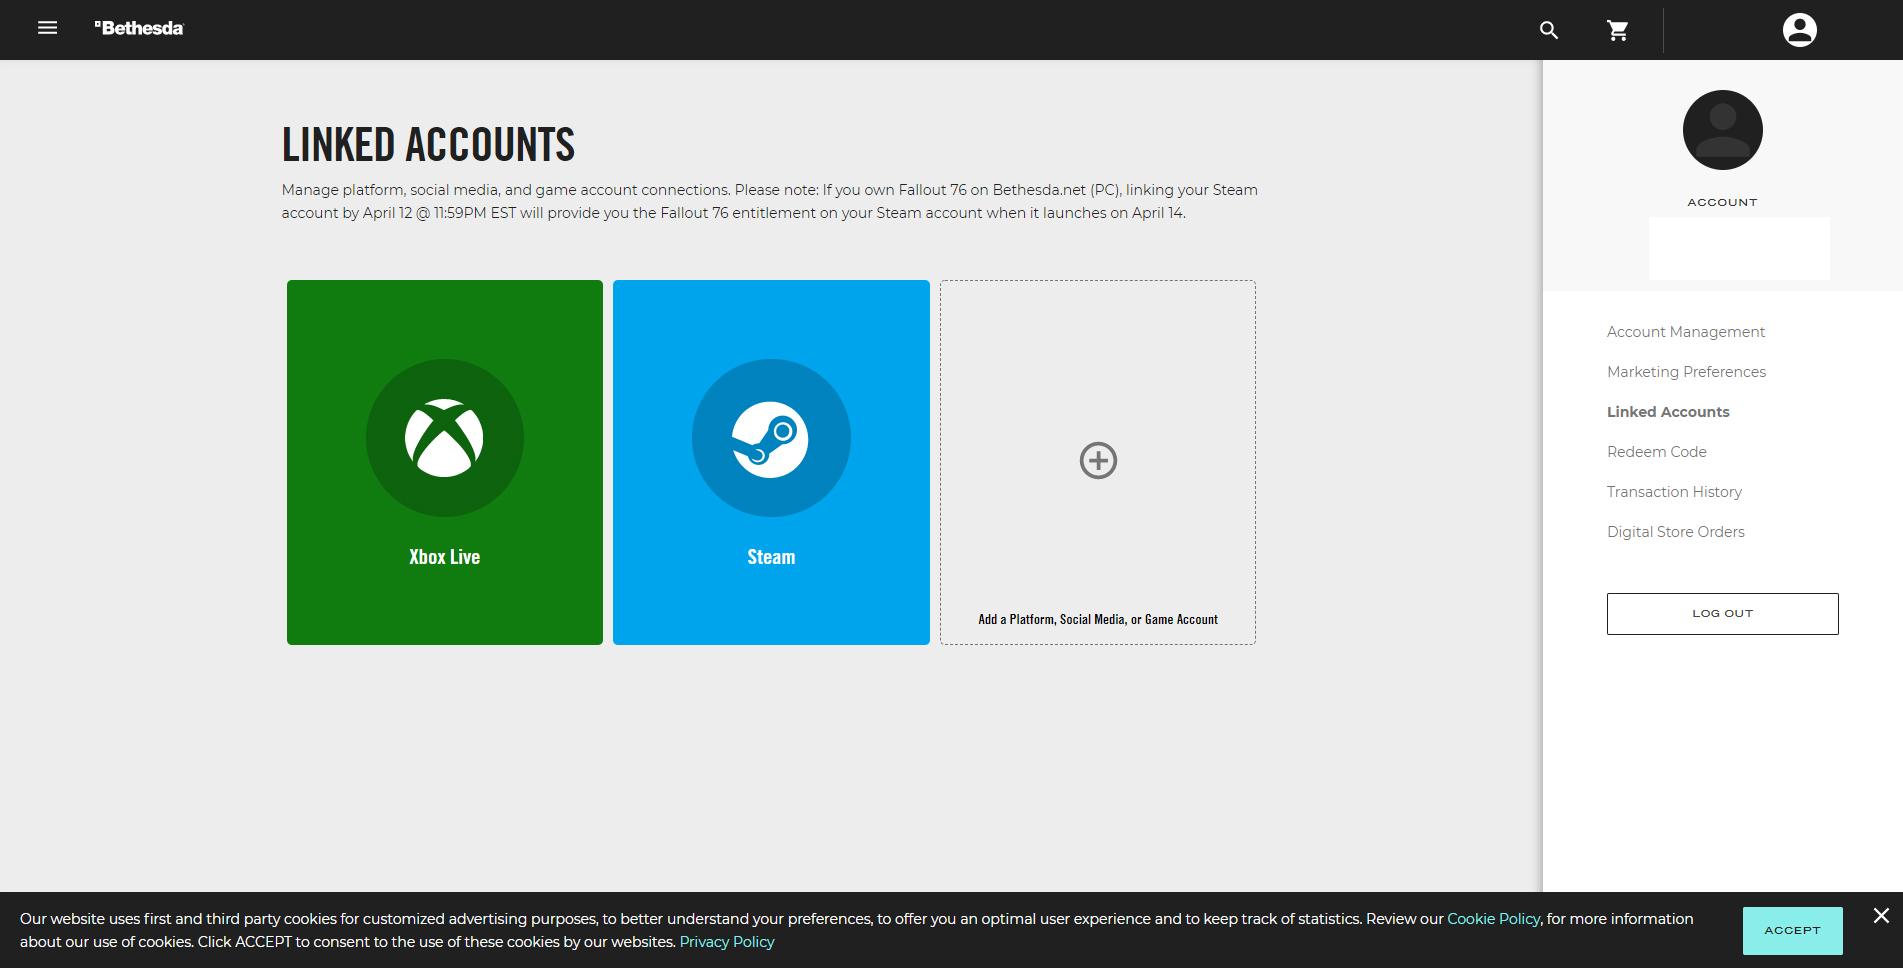 Link Bethesda to Steam account